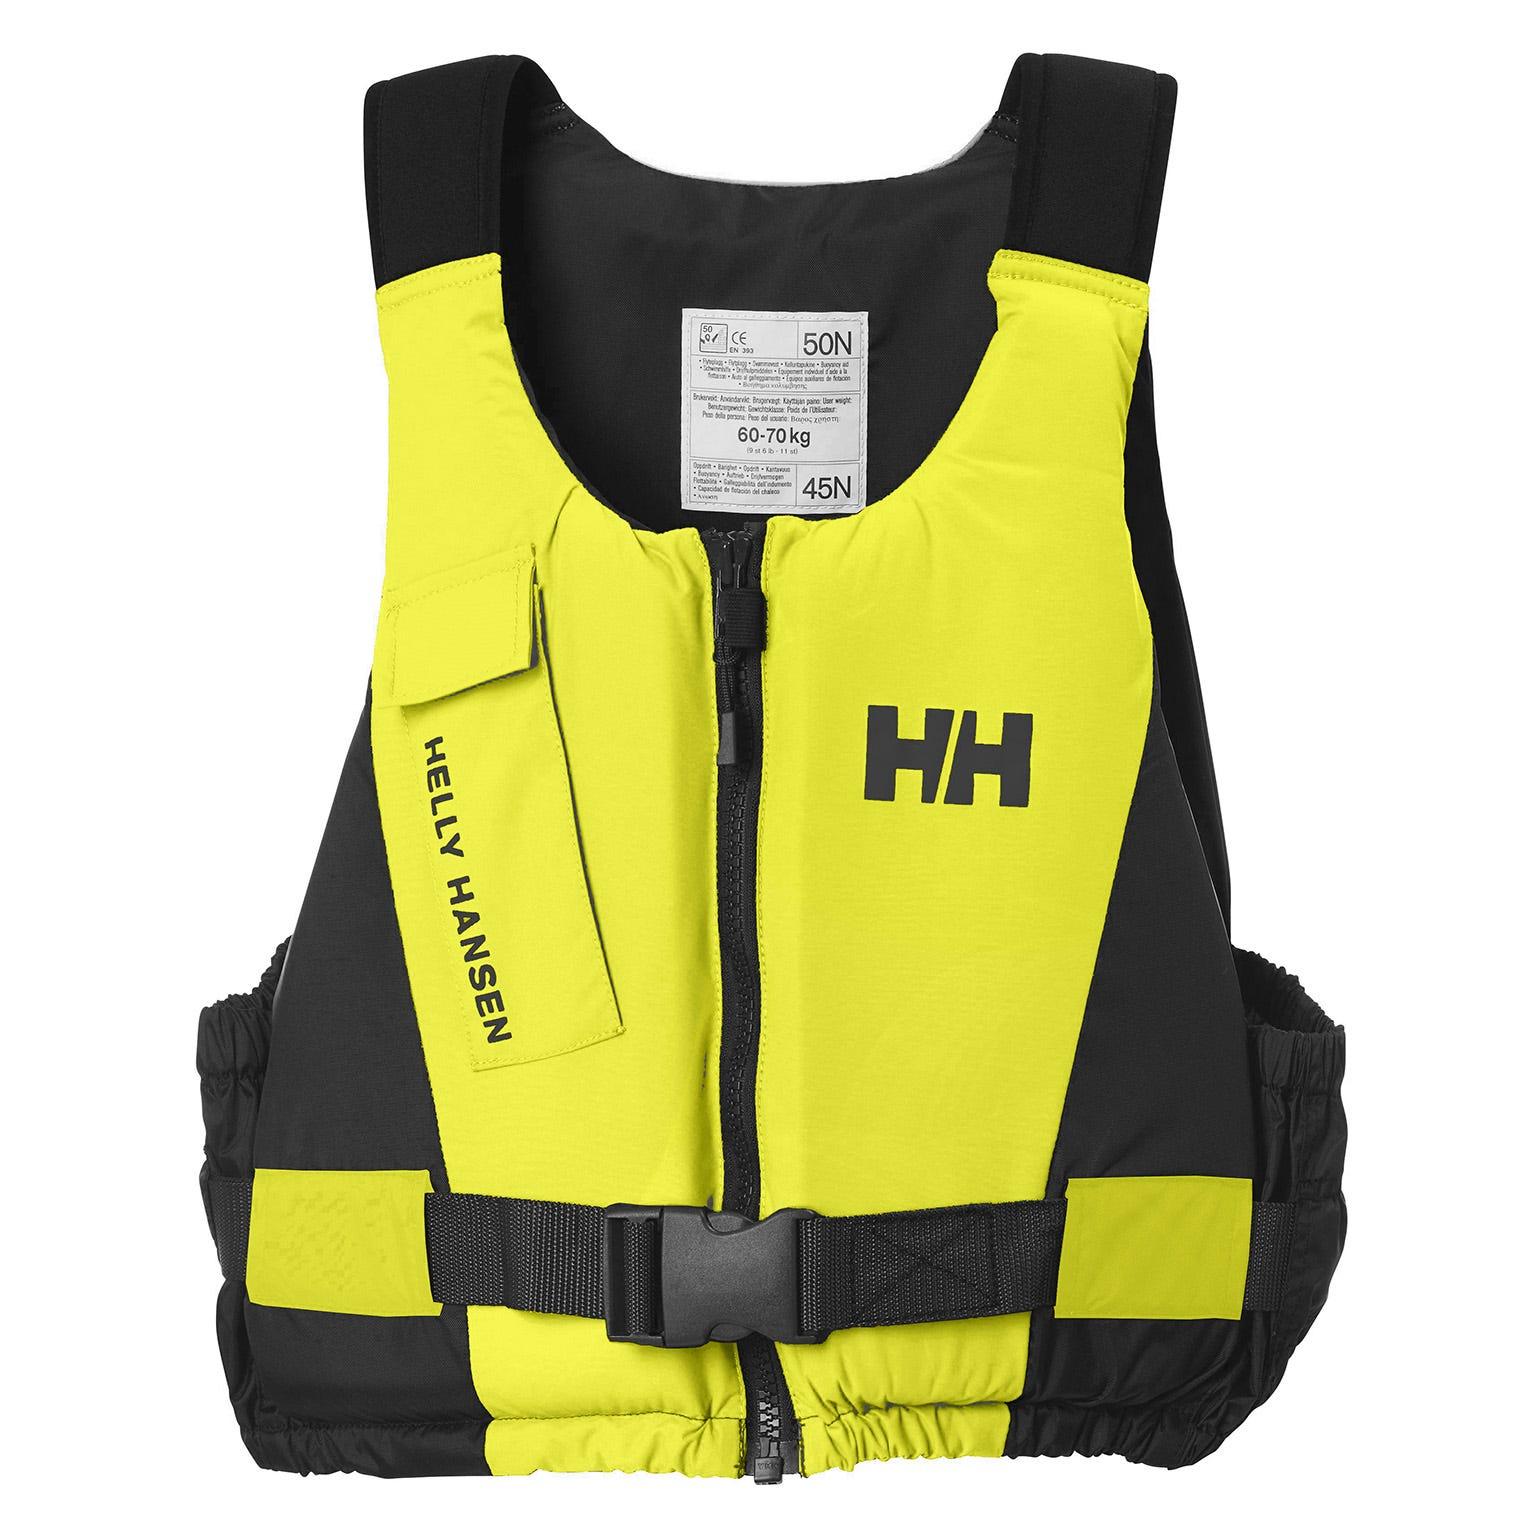 Helly Hansen Crew Vest Gilet Nautique Homme